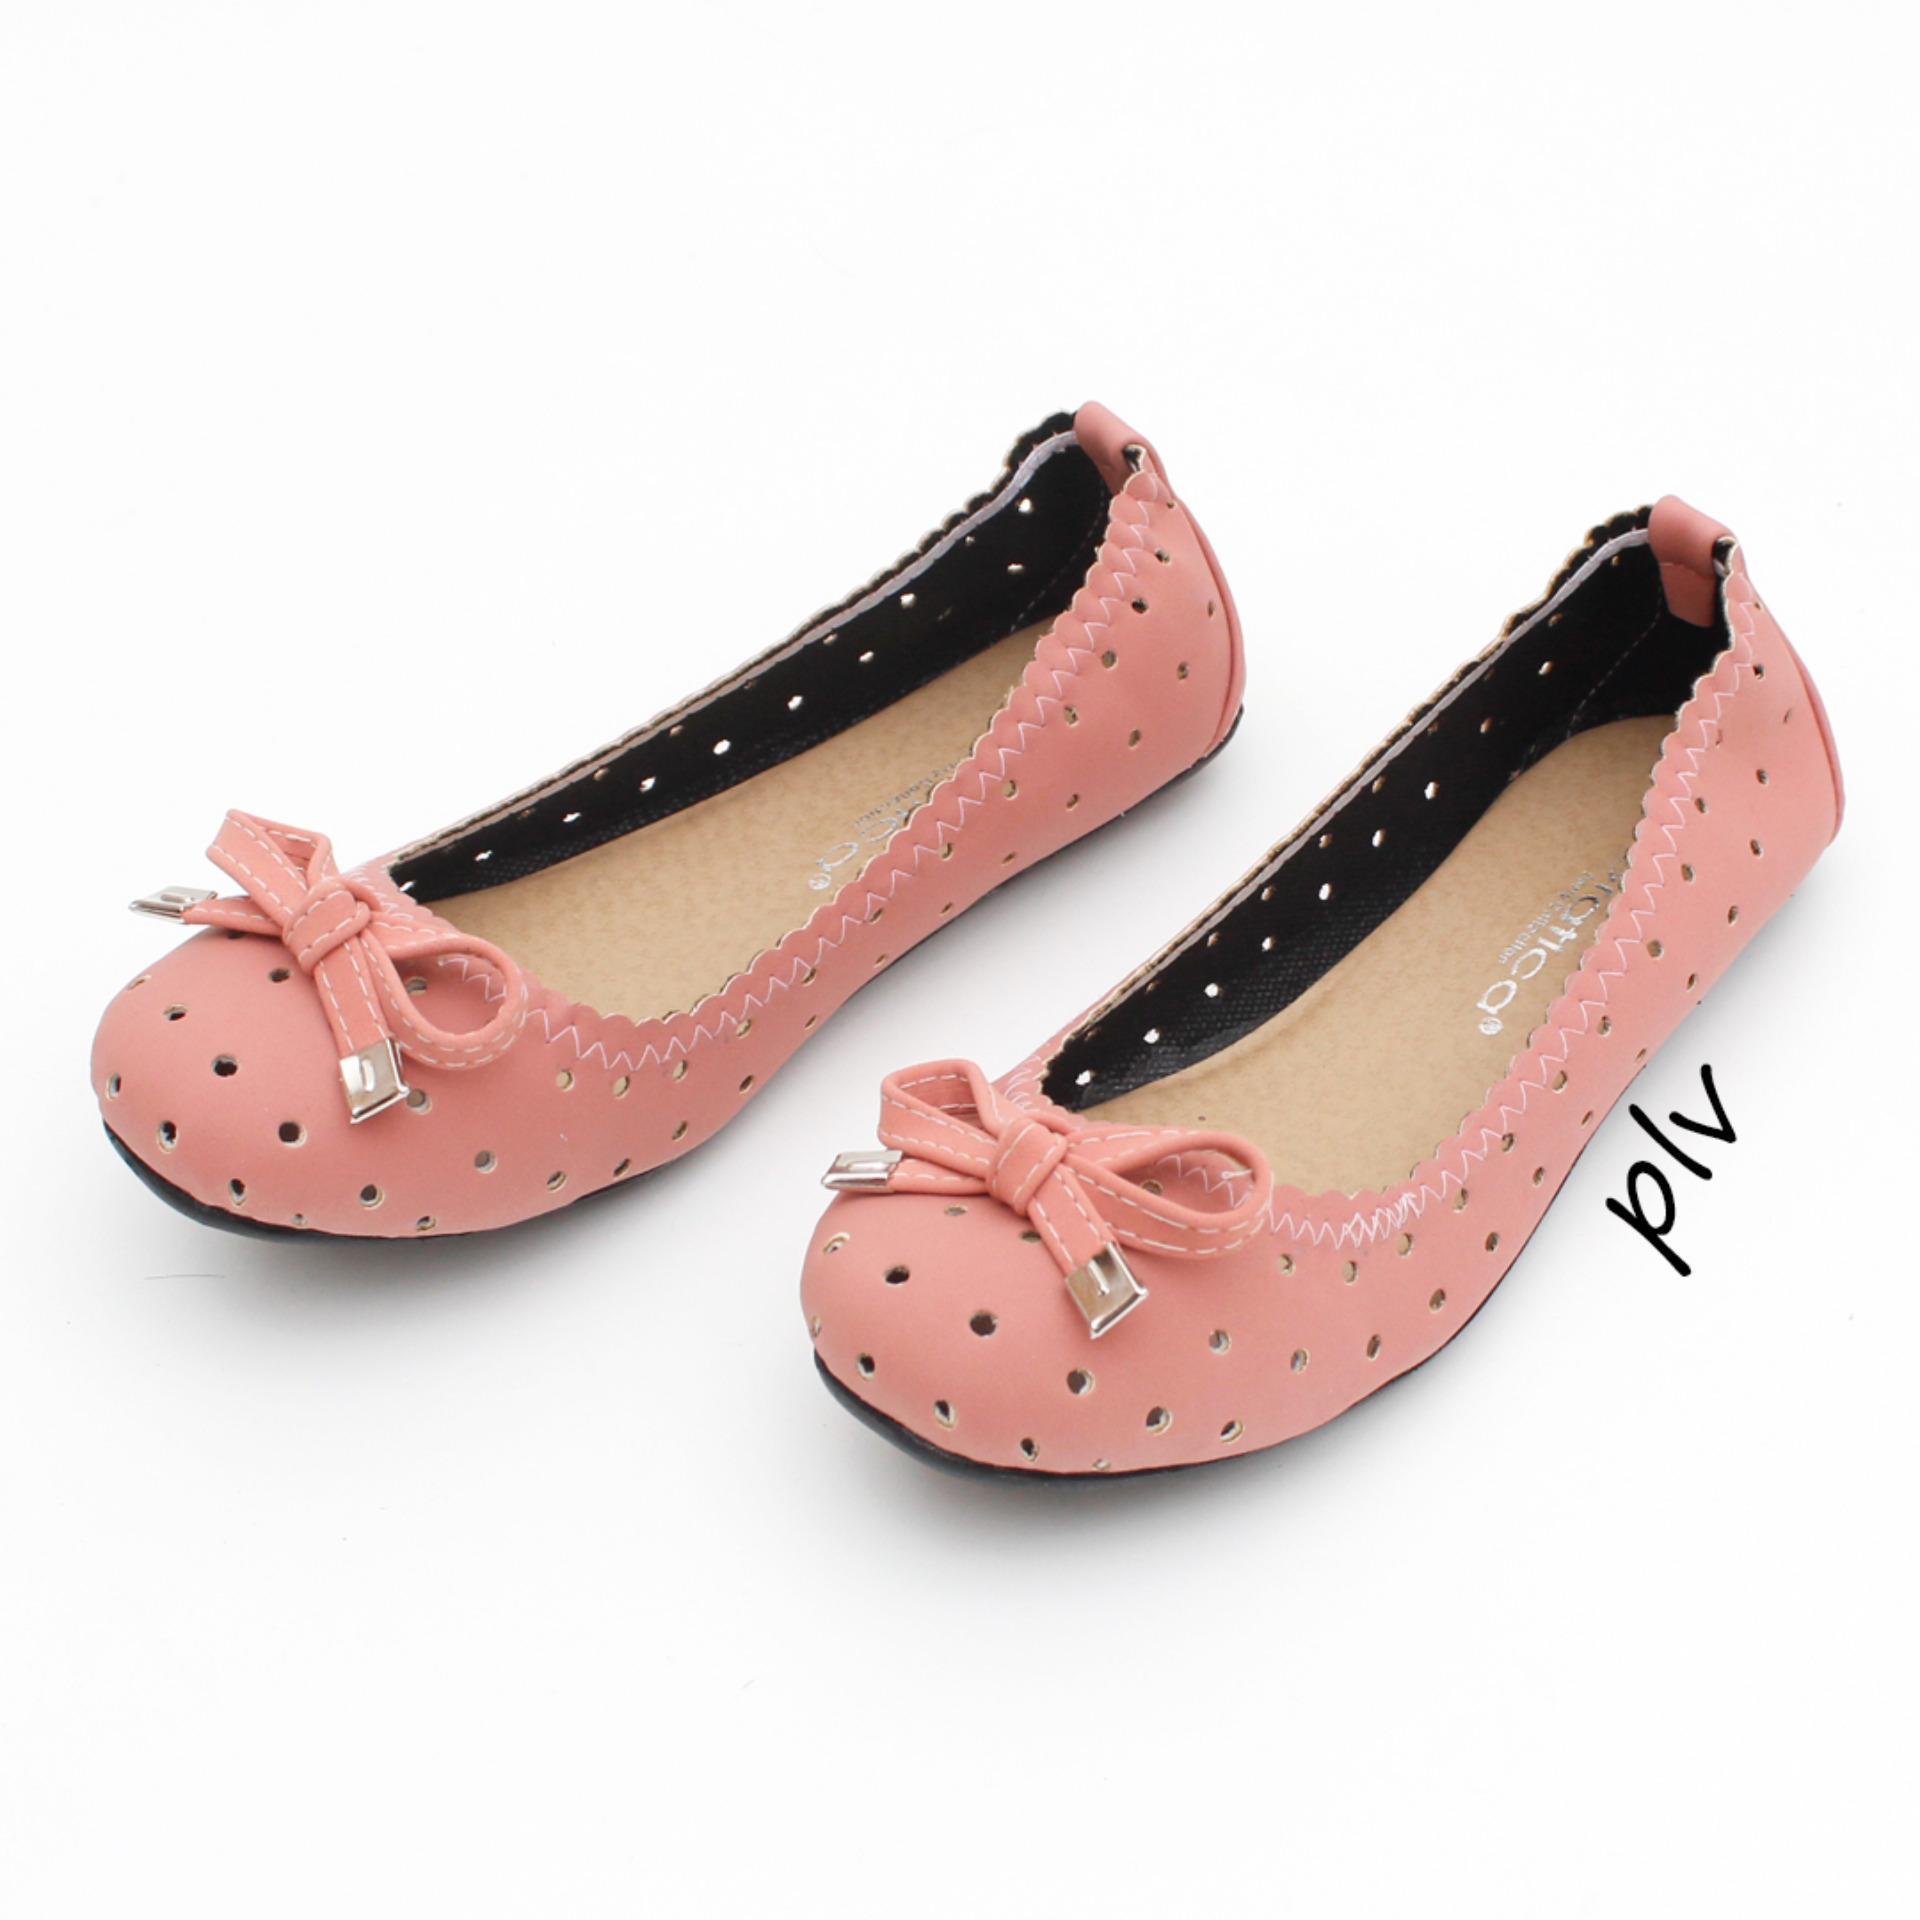 Fashion Gratica Daftar Harga November 2018 Wakai Mikkusu Maroon Grey Black Sepatu Slip On Wak0002551zz895 Hitam 36